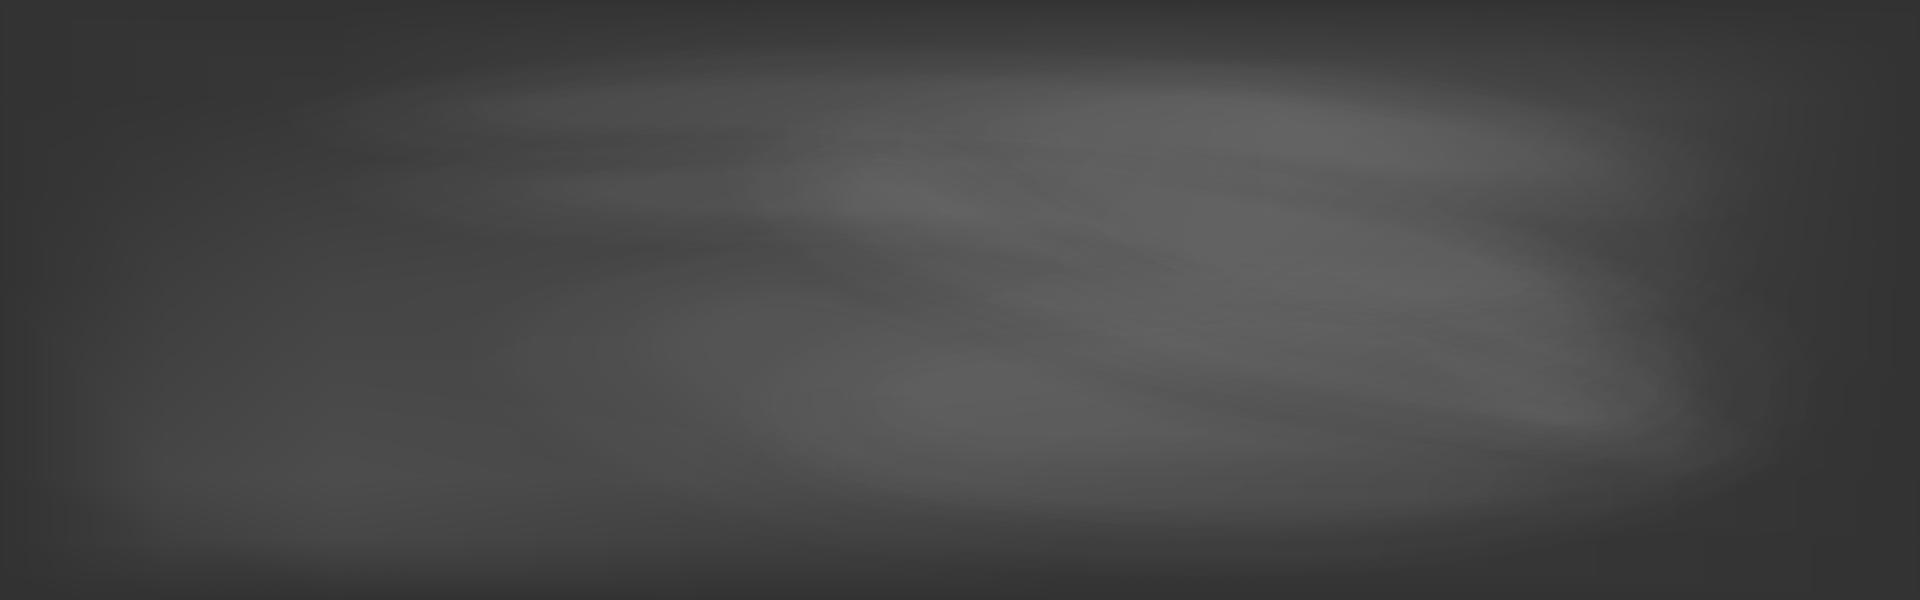 black backgound